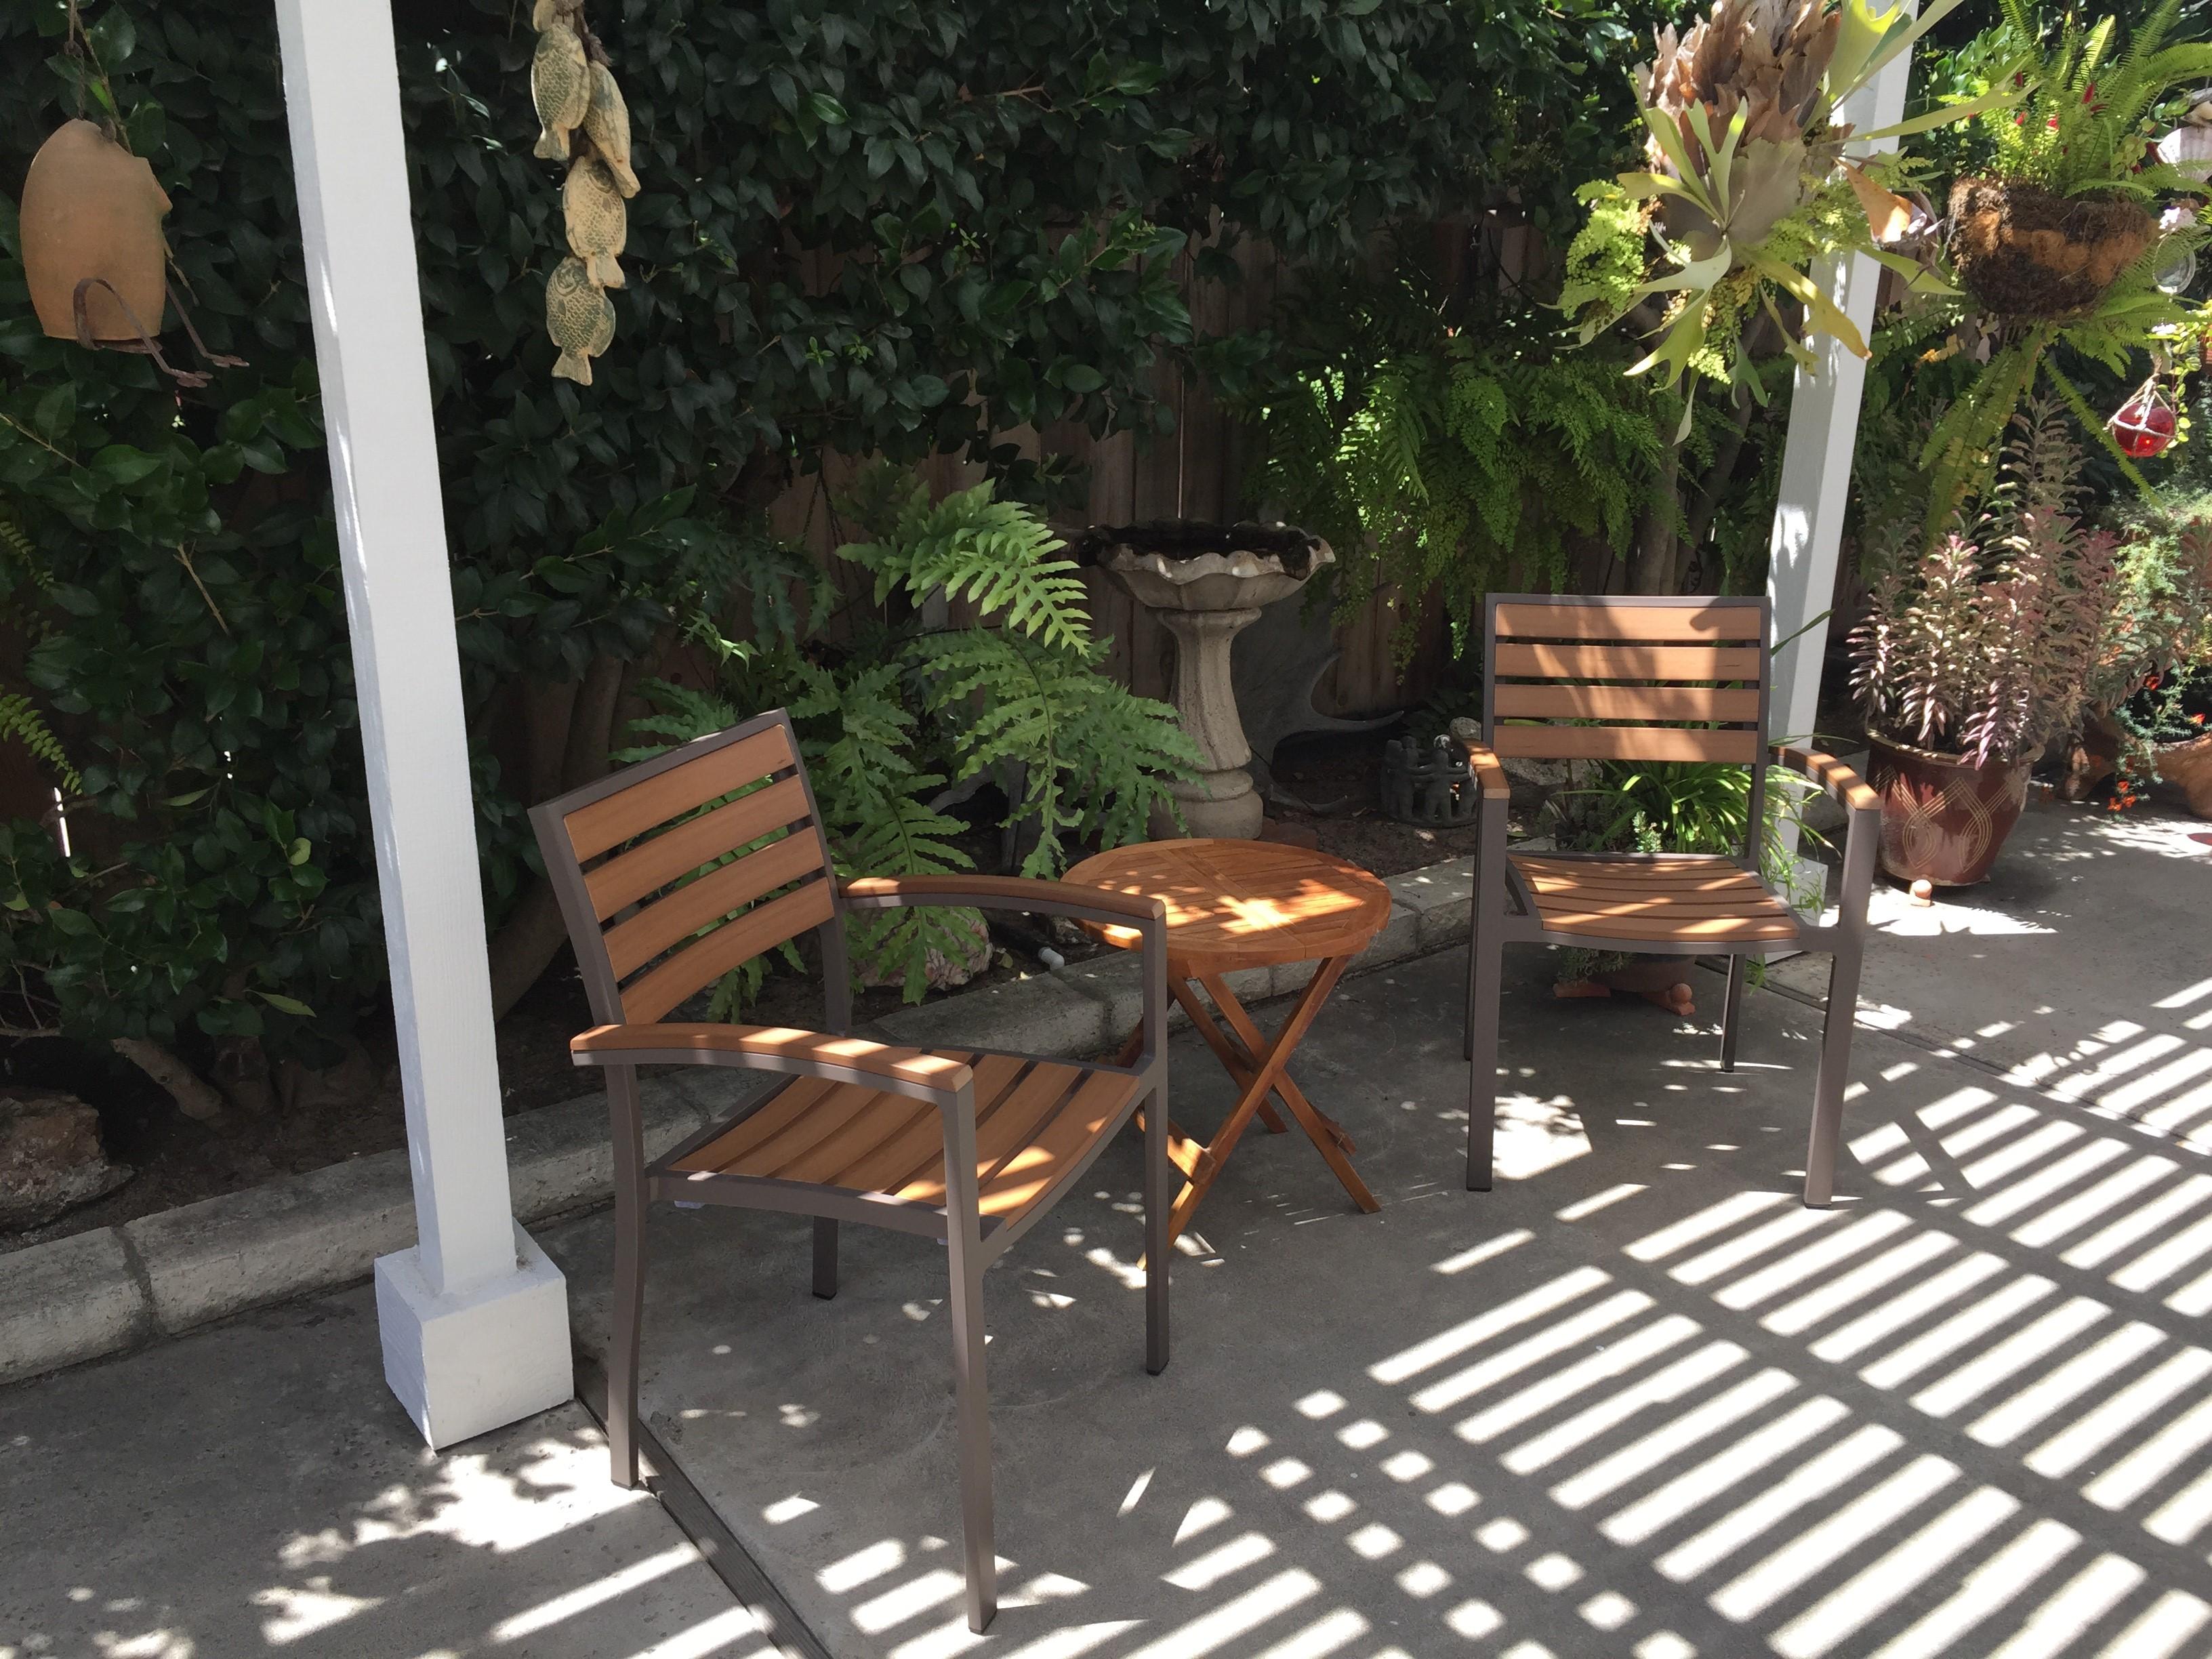 Teak posite Chairs for Residential Design